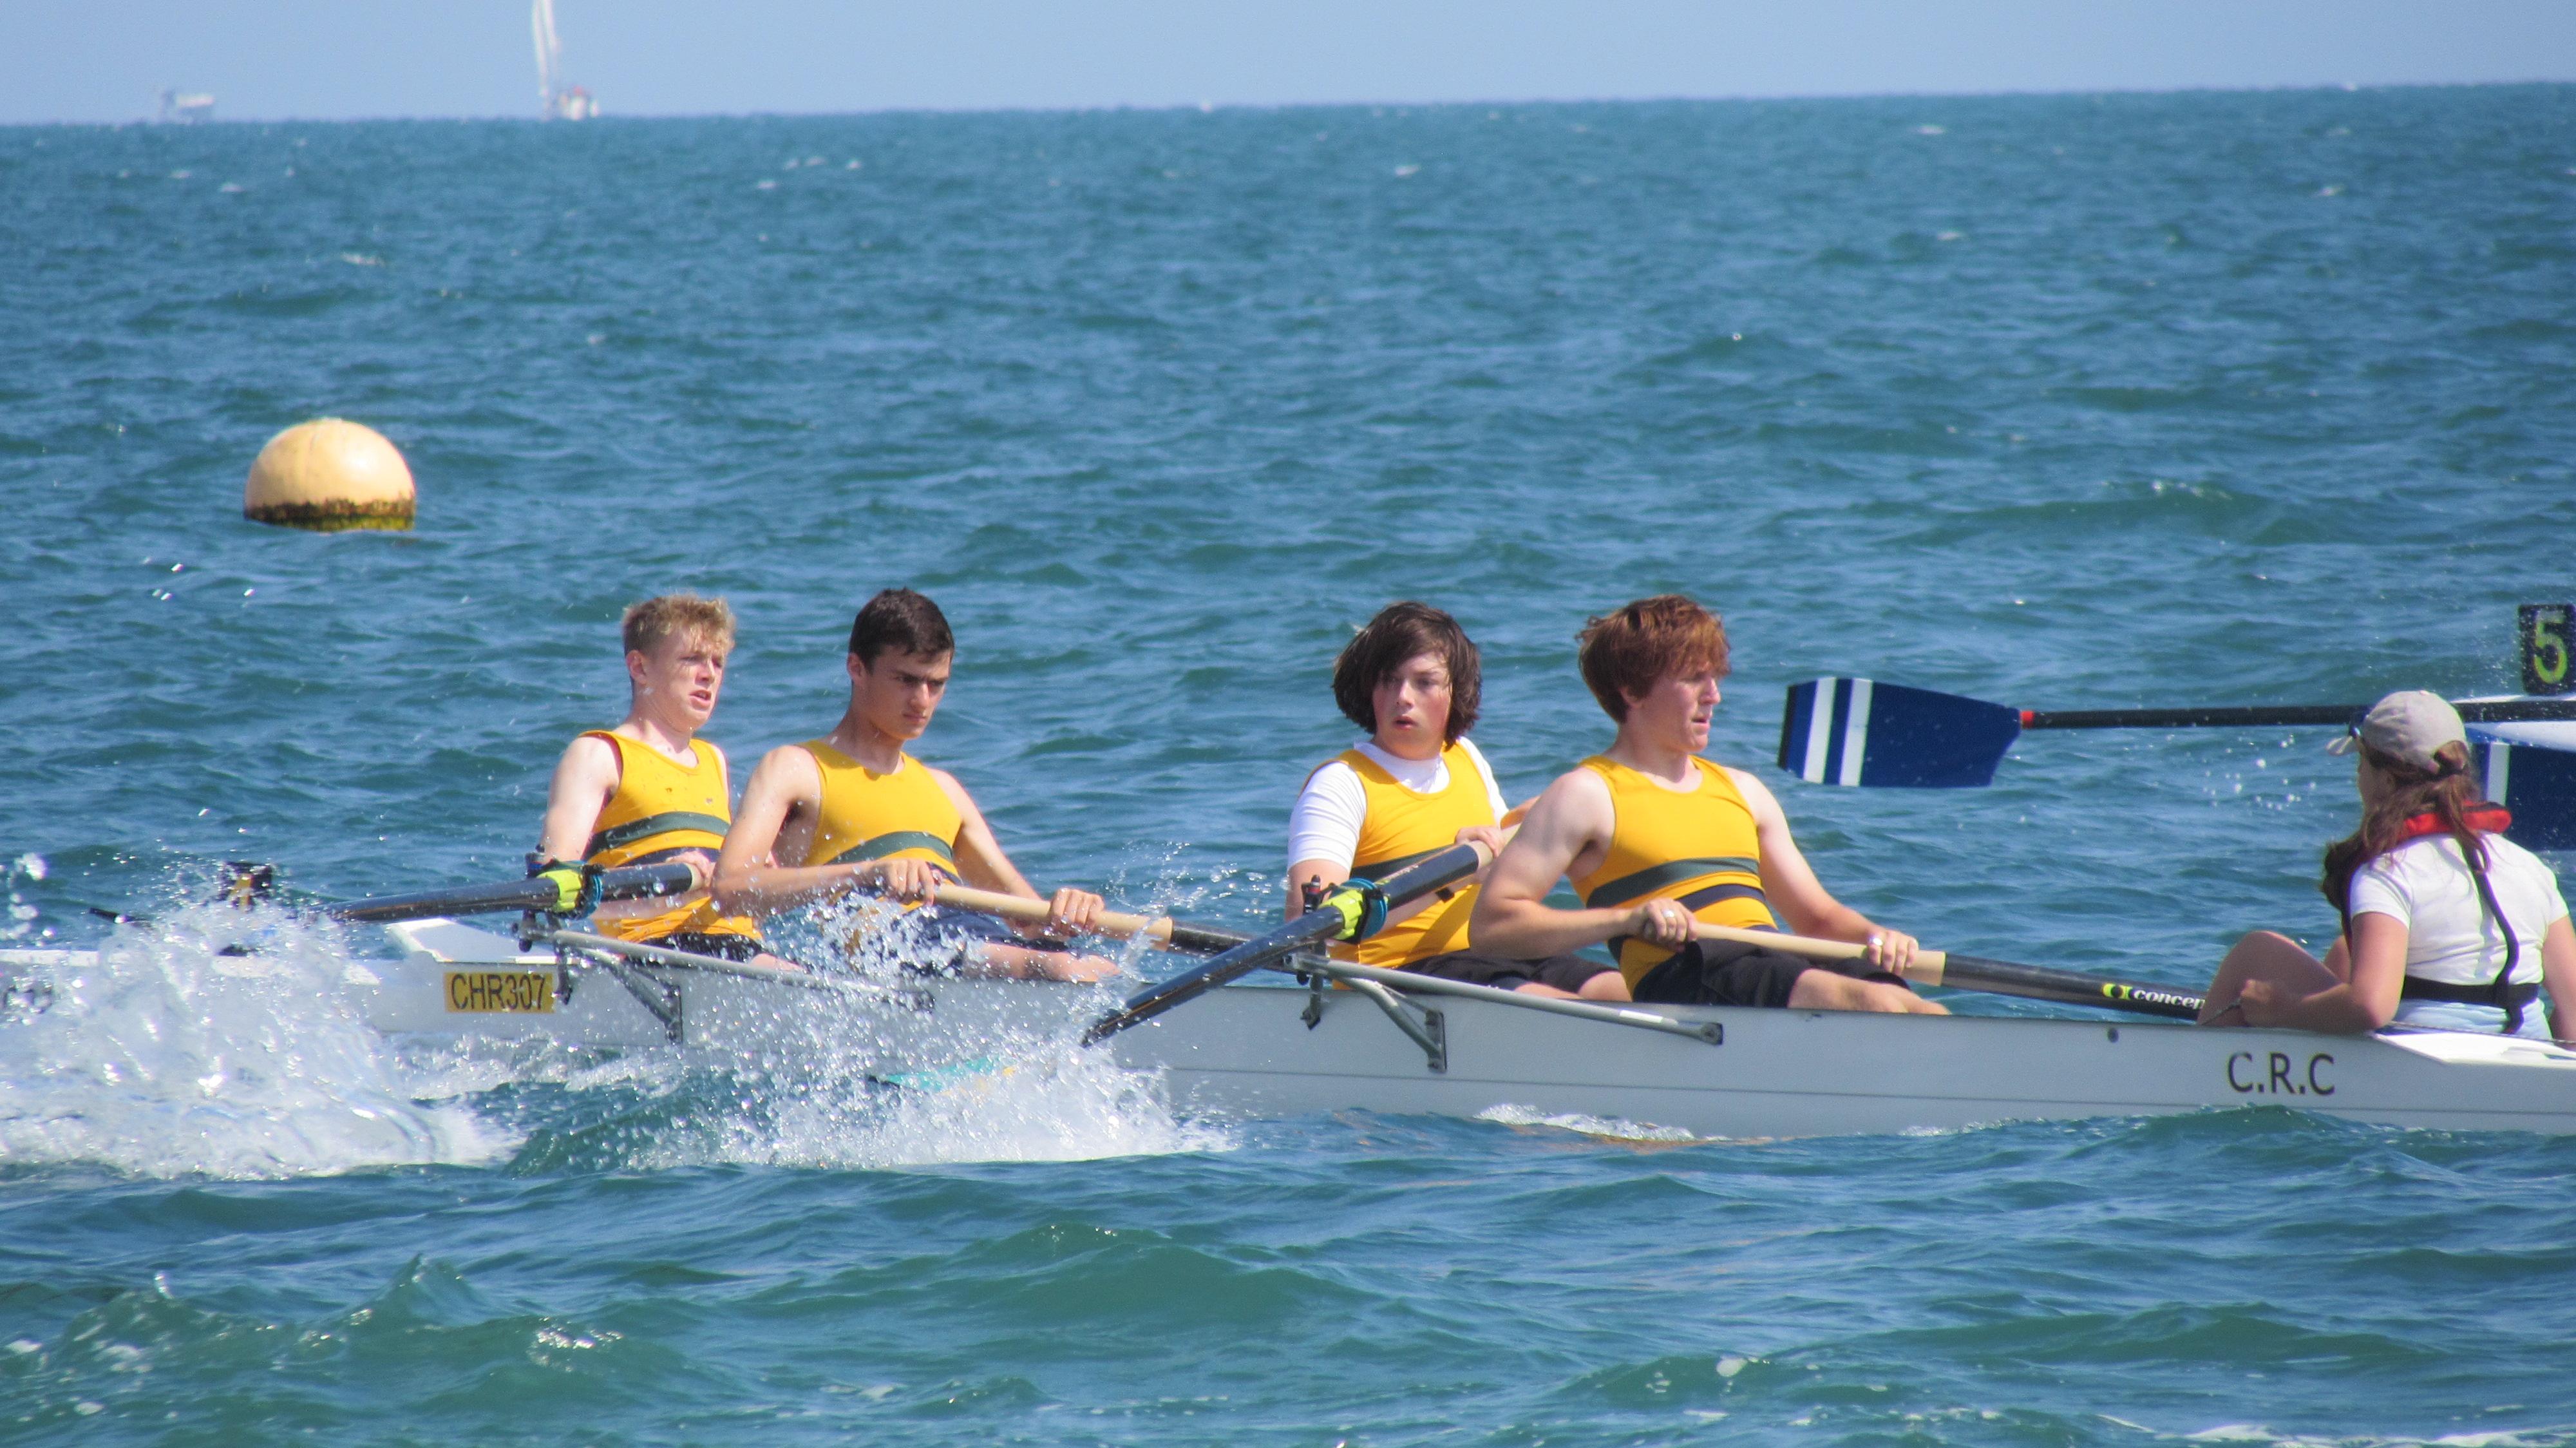 Southsea Regatta